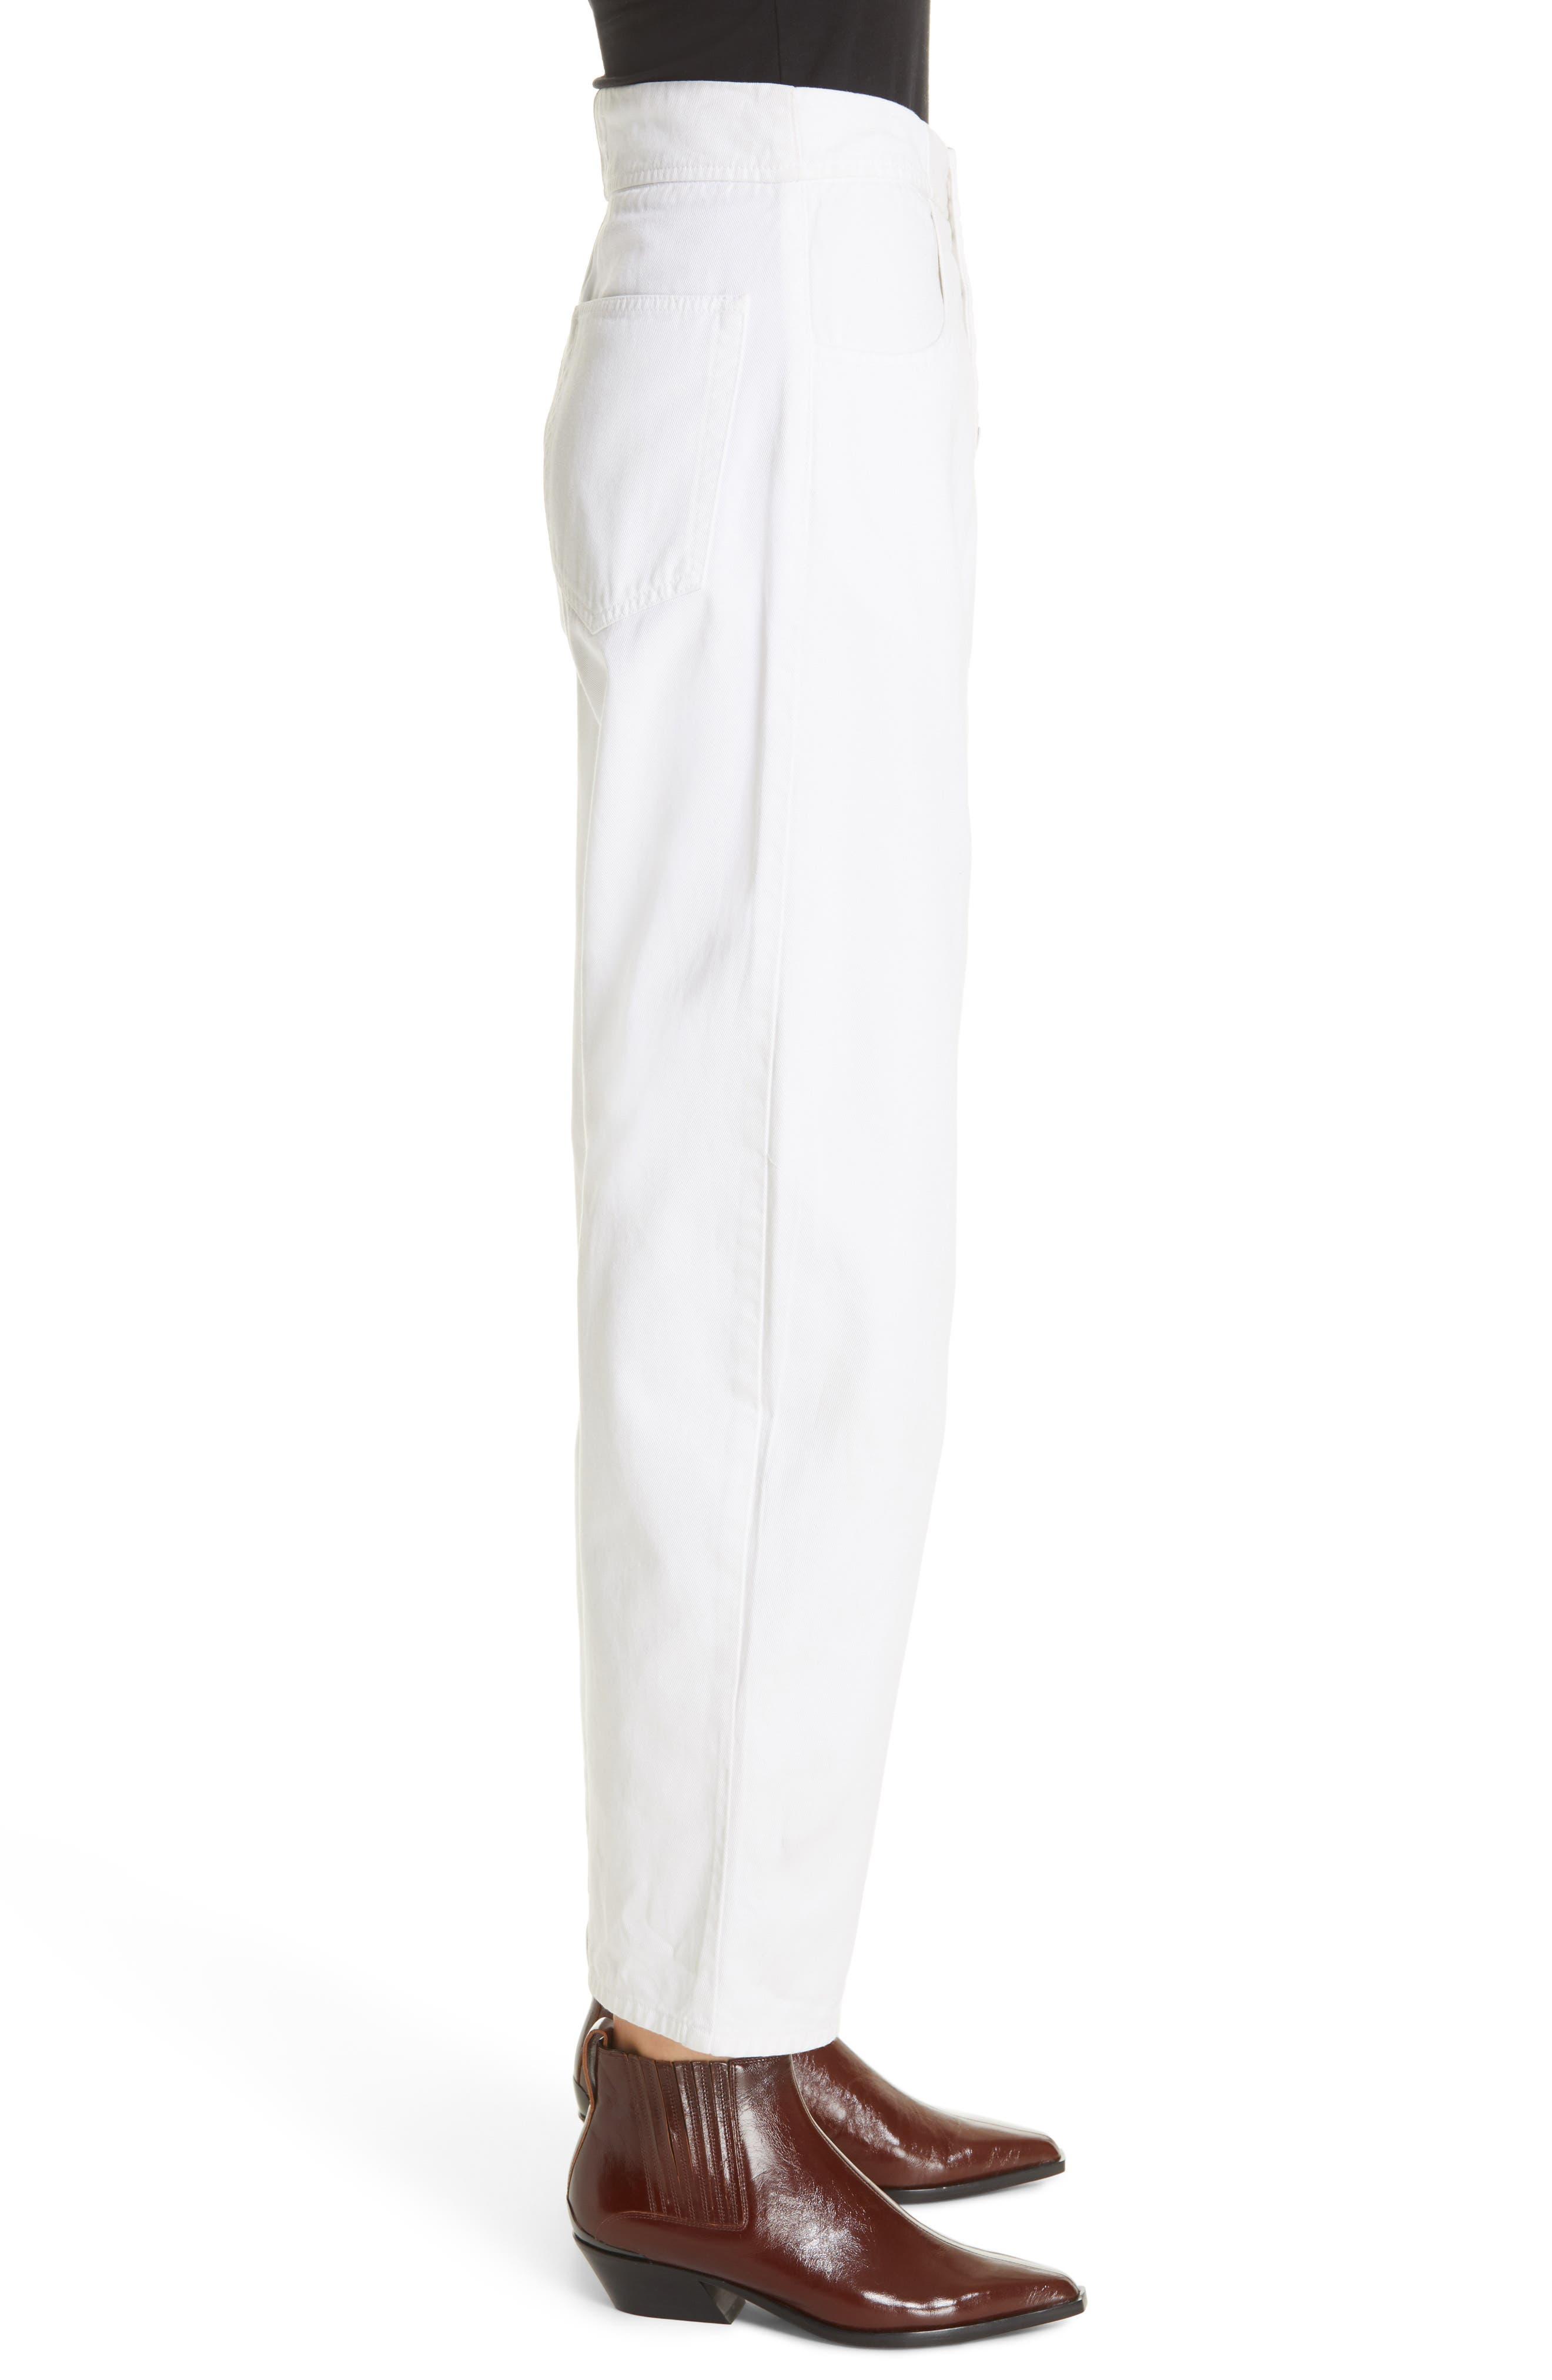 NILI LOTAN, Toledo Crop Cotton Pants, Alternate thumbnail 4, color, VINTAGE WHITE